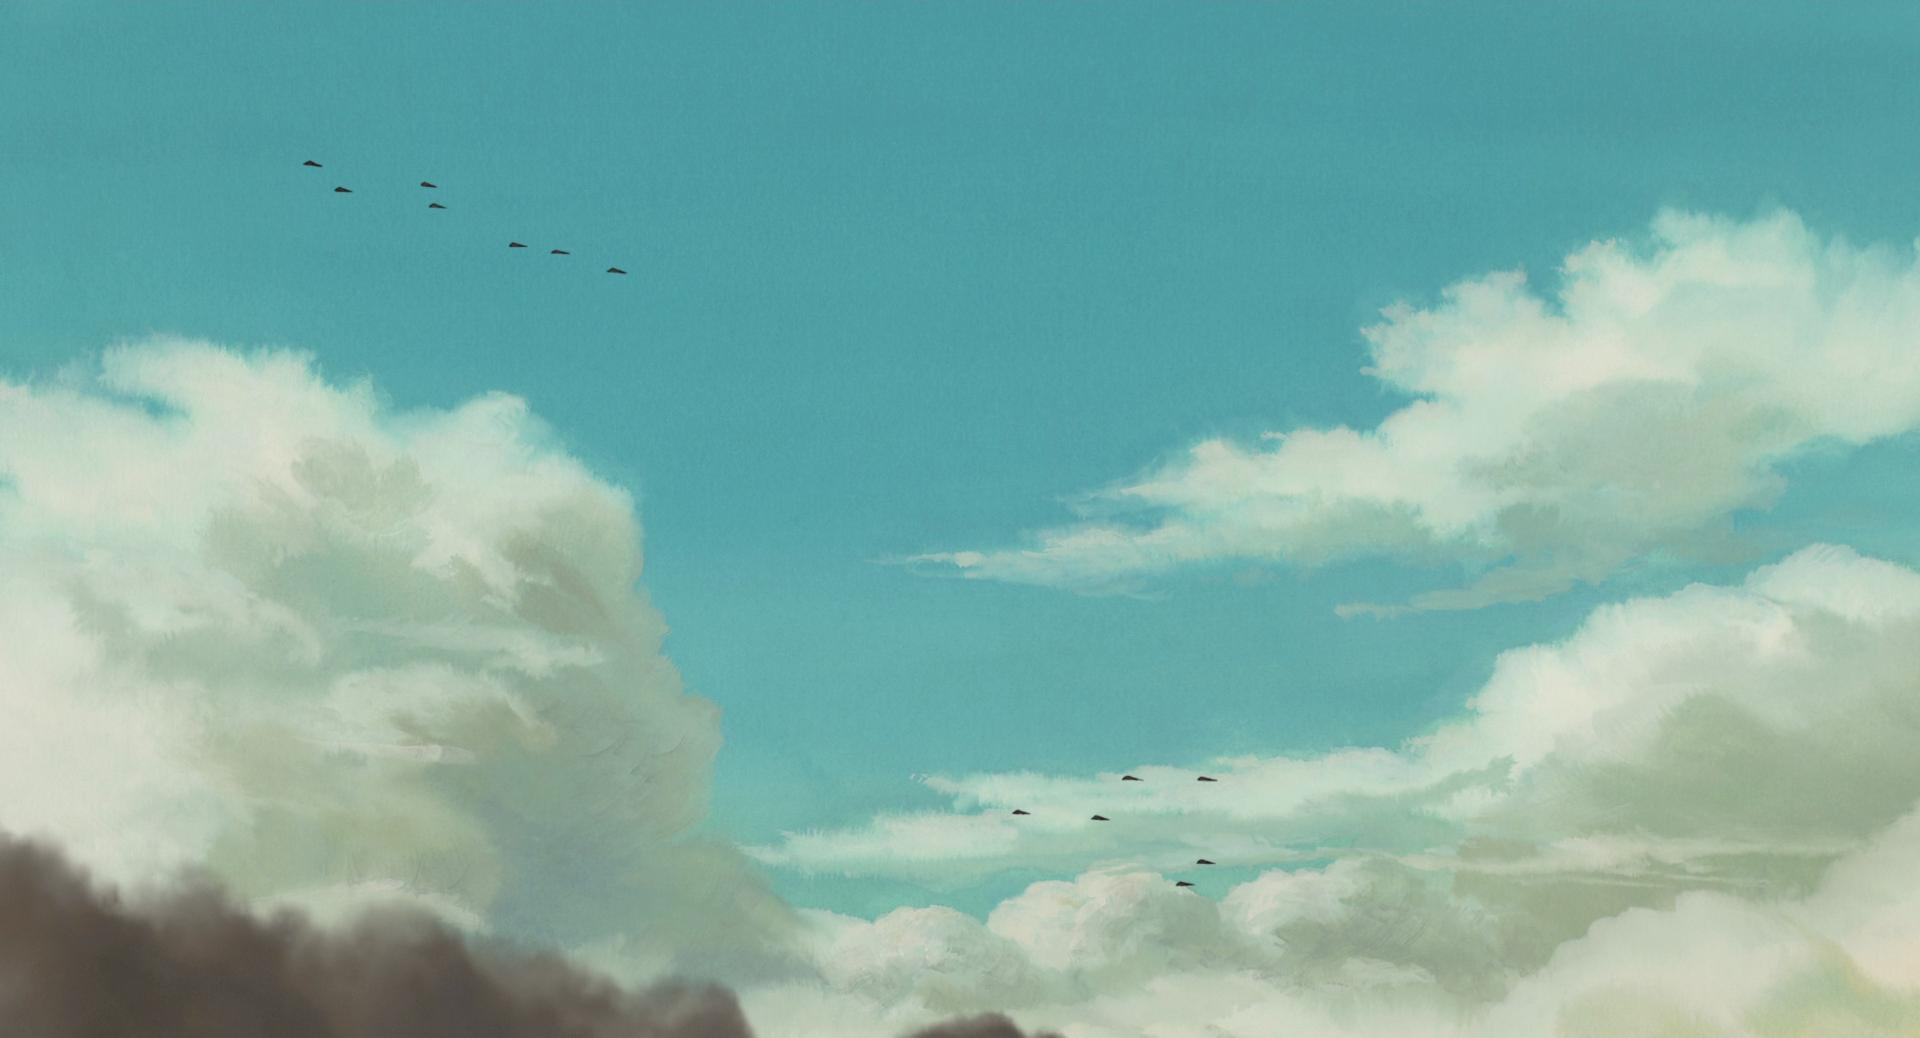 Wallpaper For Tablet Cute Studio Ghibli Hayao Miyazaki Anime Landscape Anime Sky